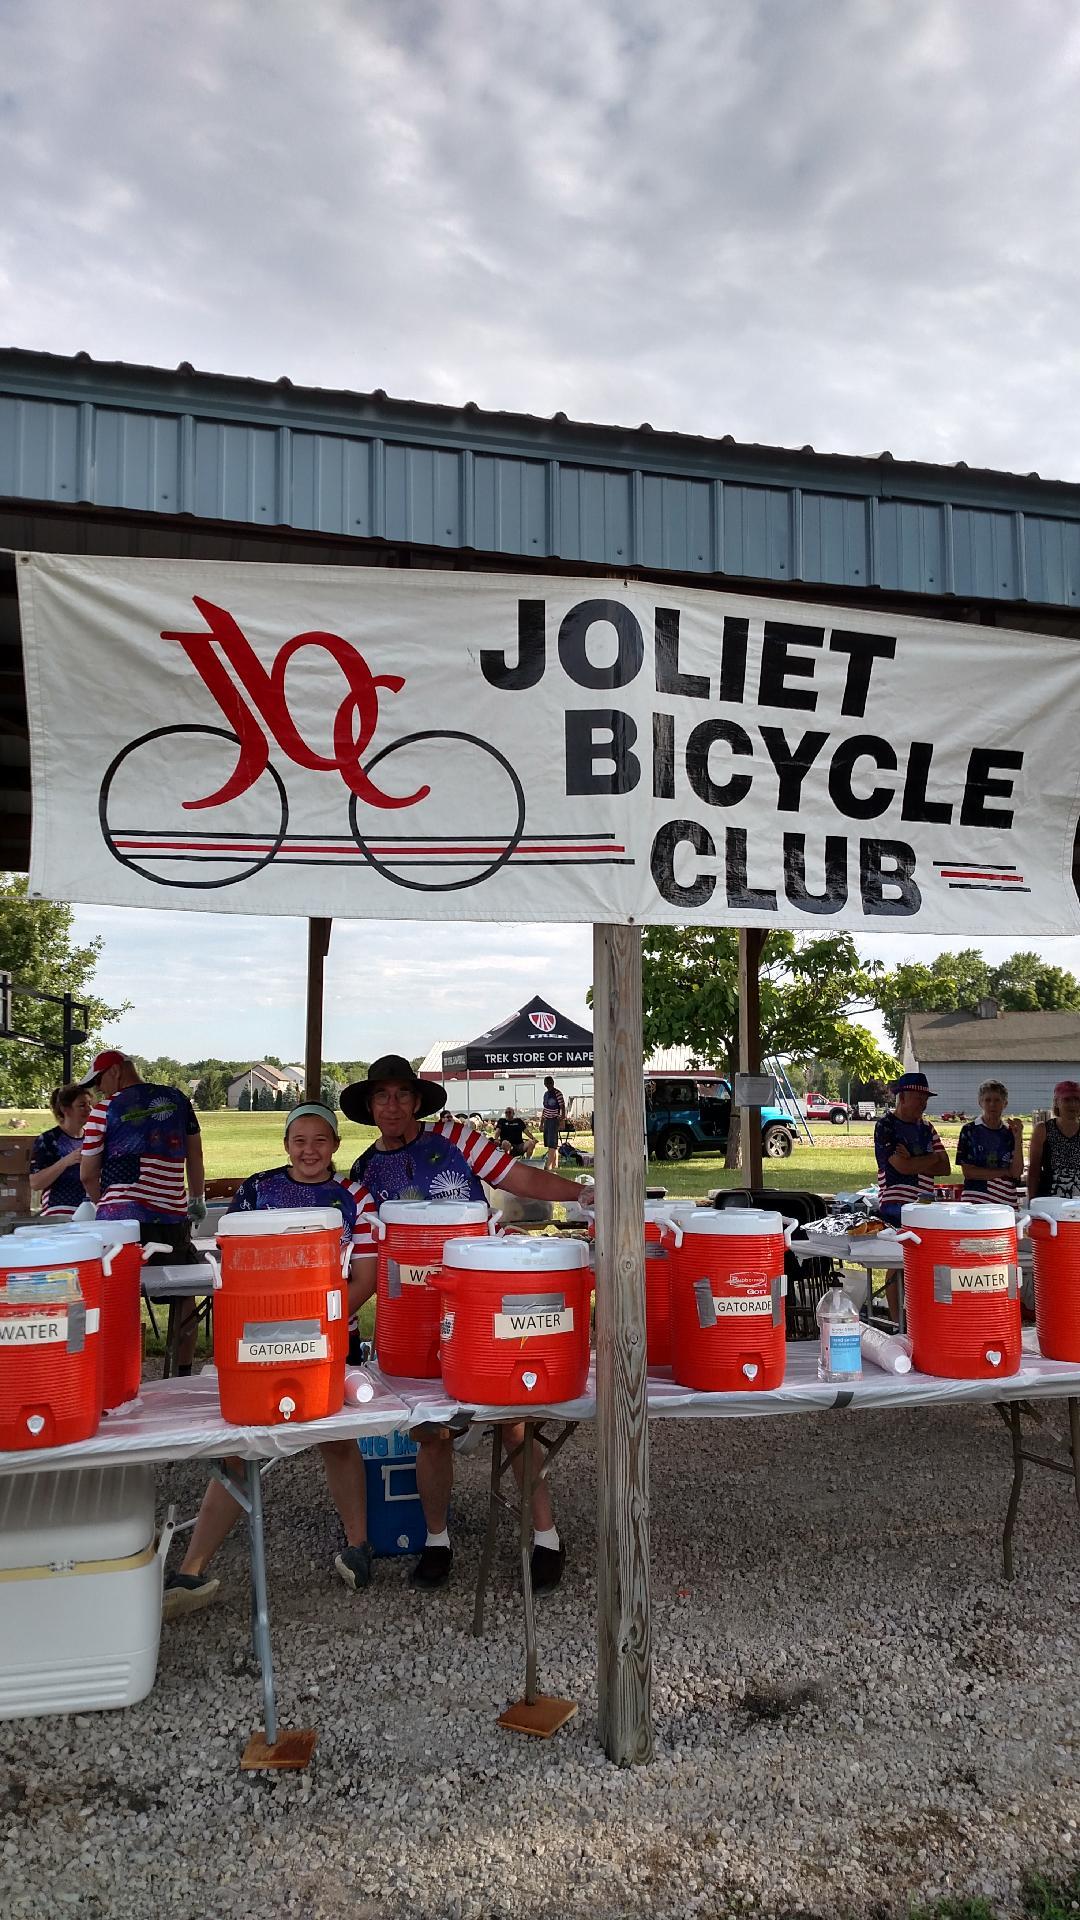 2019 July 4th Photos > JolietBicycleClub com